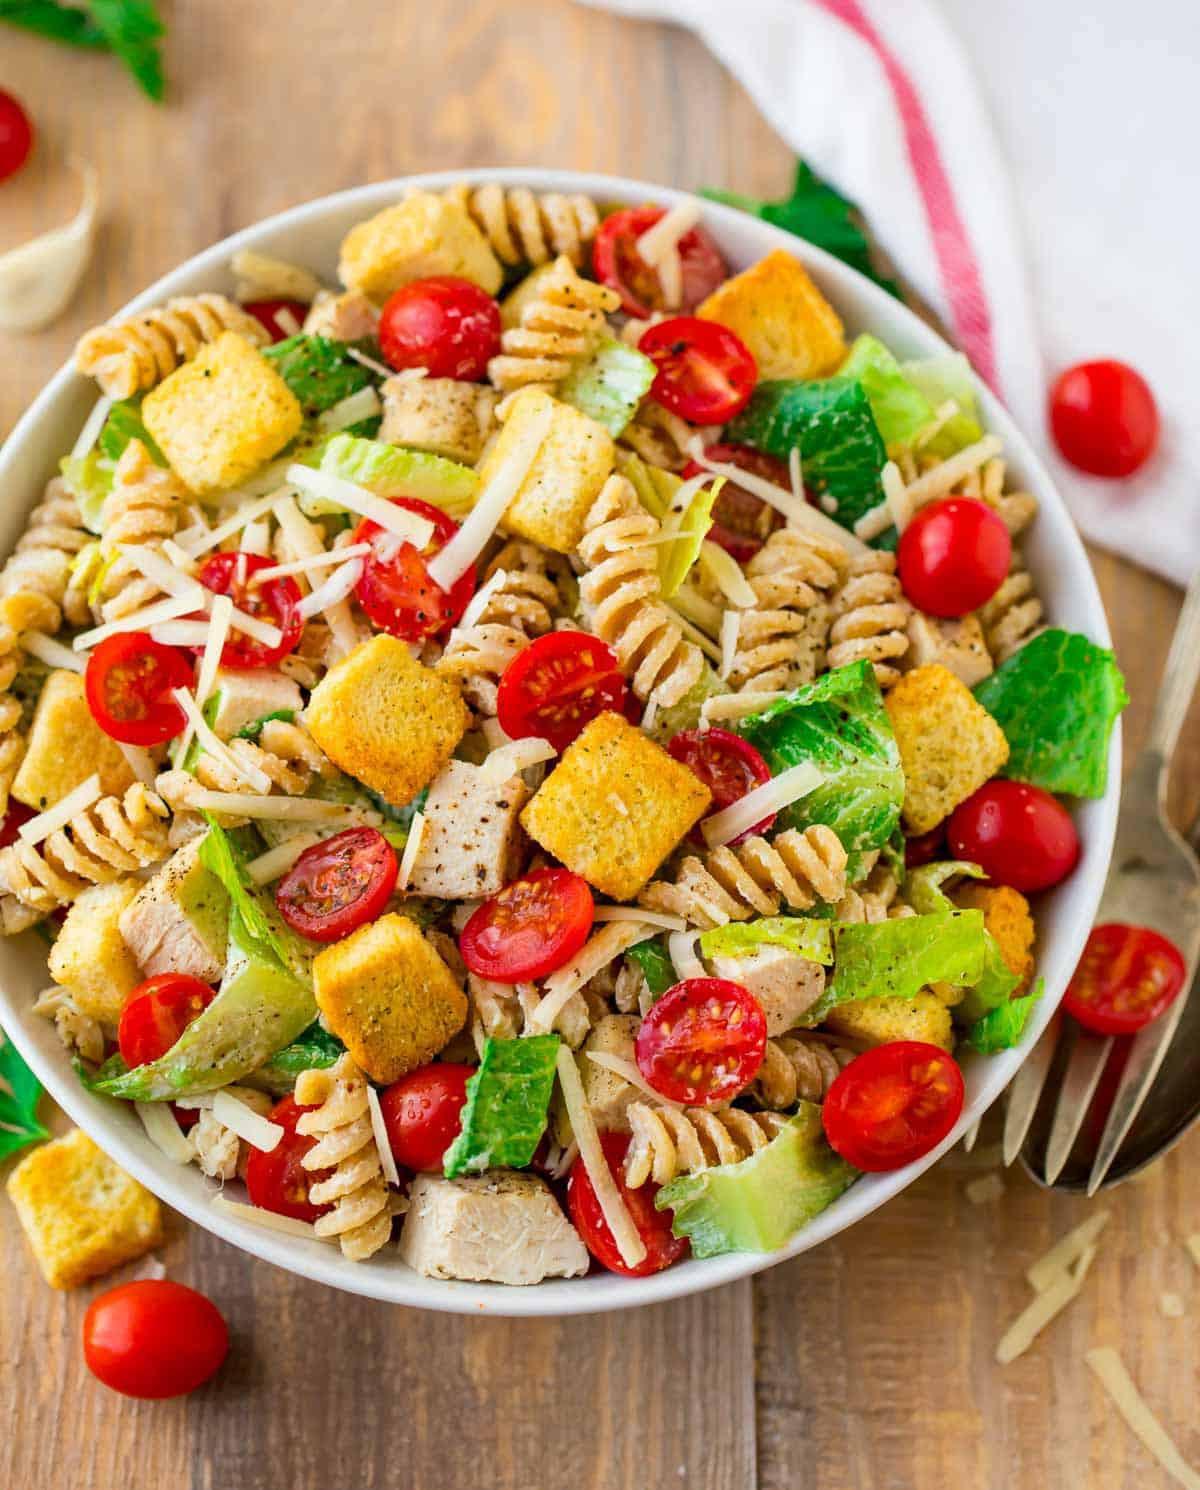 Healthy Pasta Salad Recipes  Chicken Caesar Pasta Salad